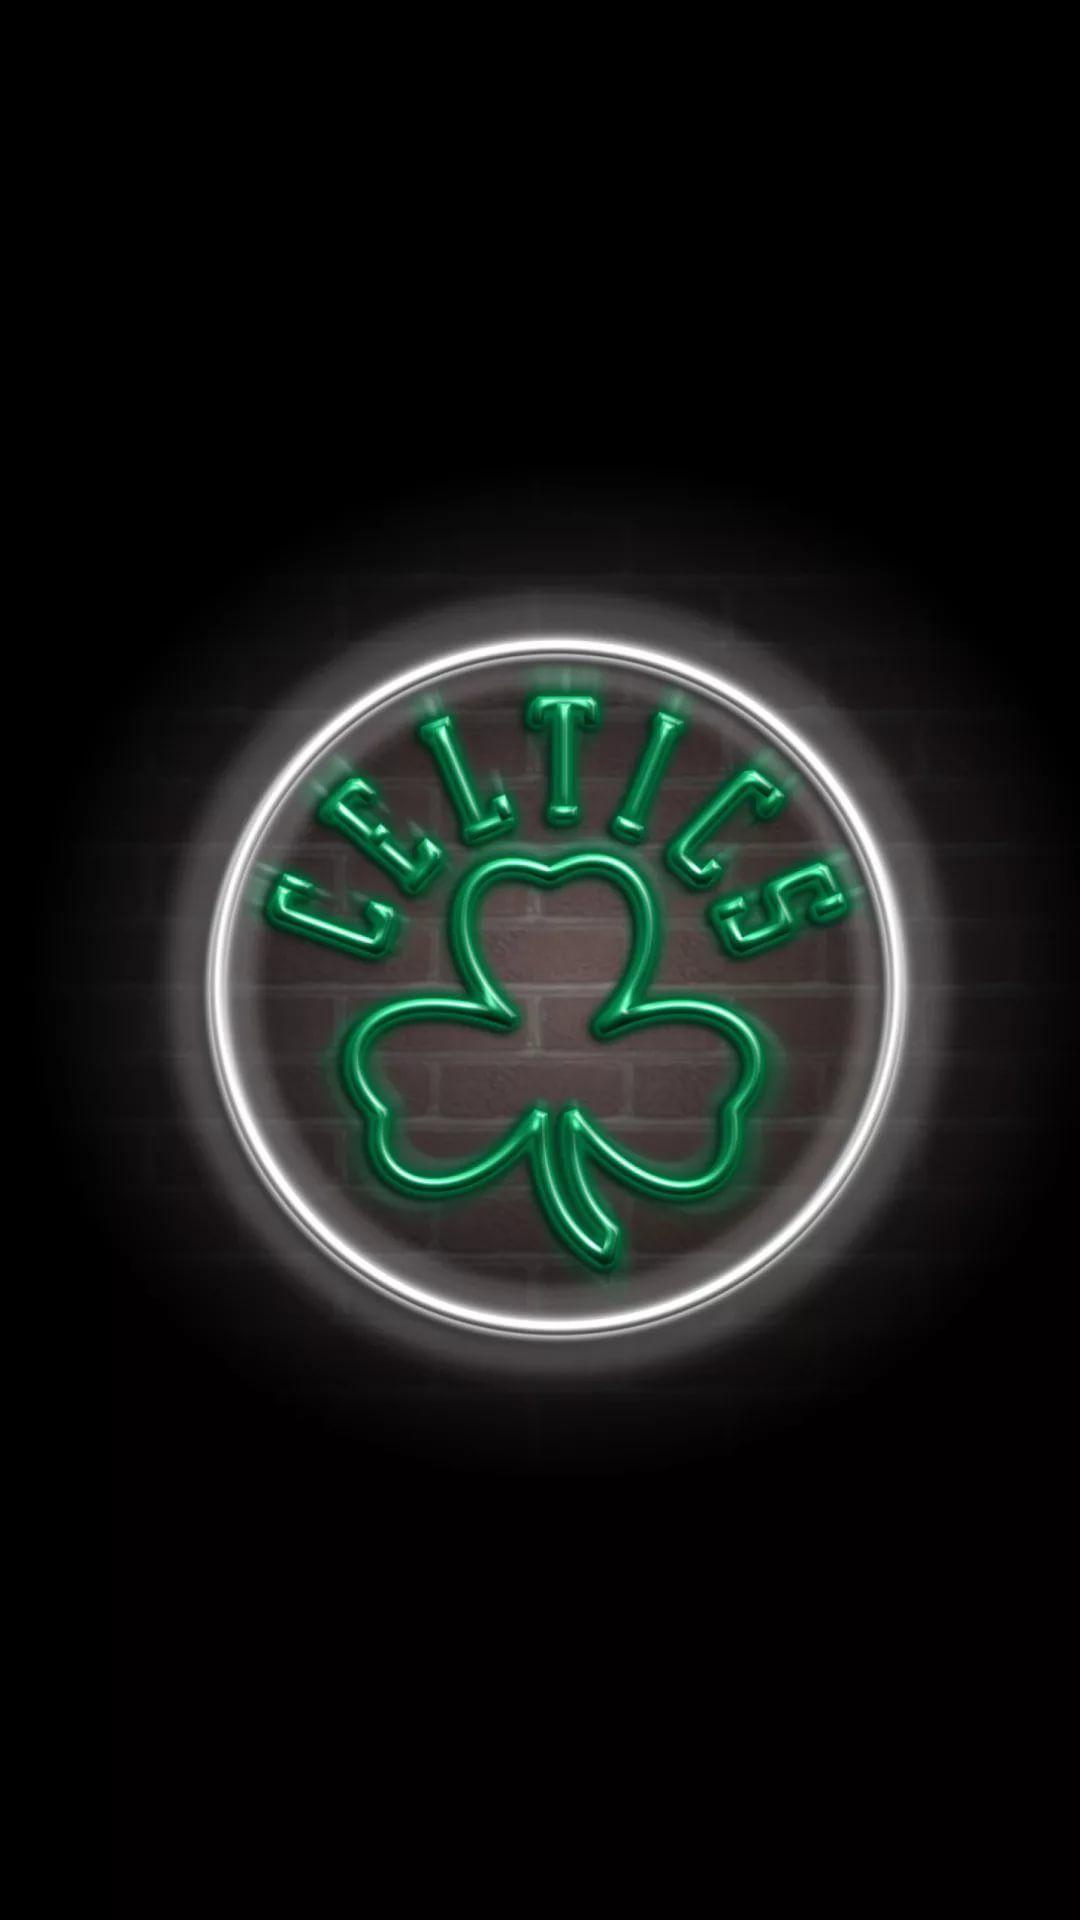 Celtic Fc iPhone wallpaper